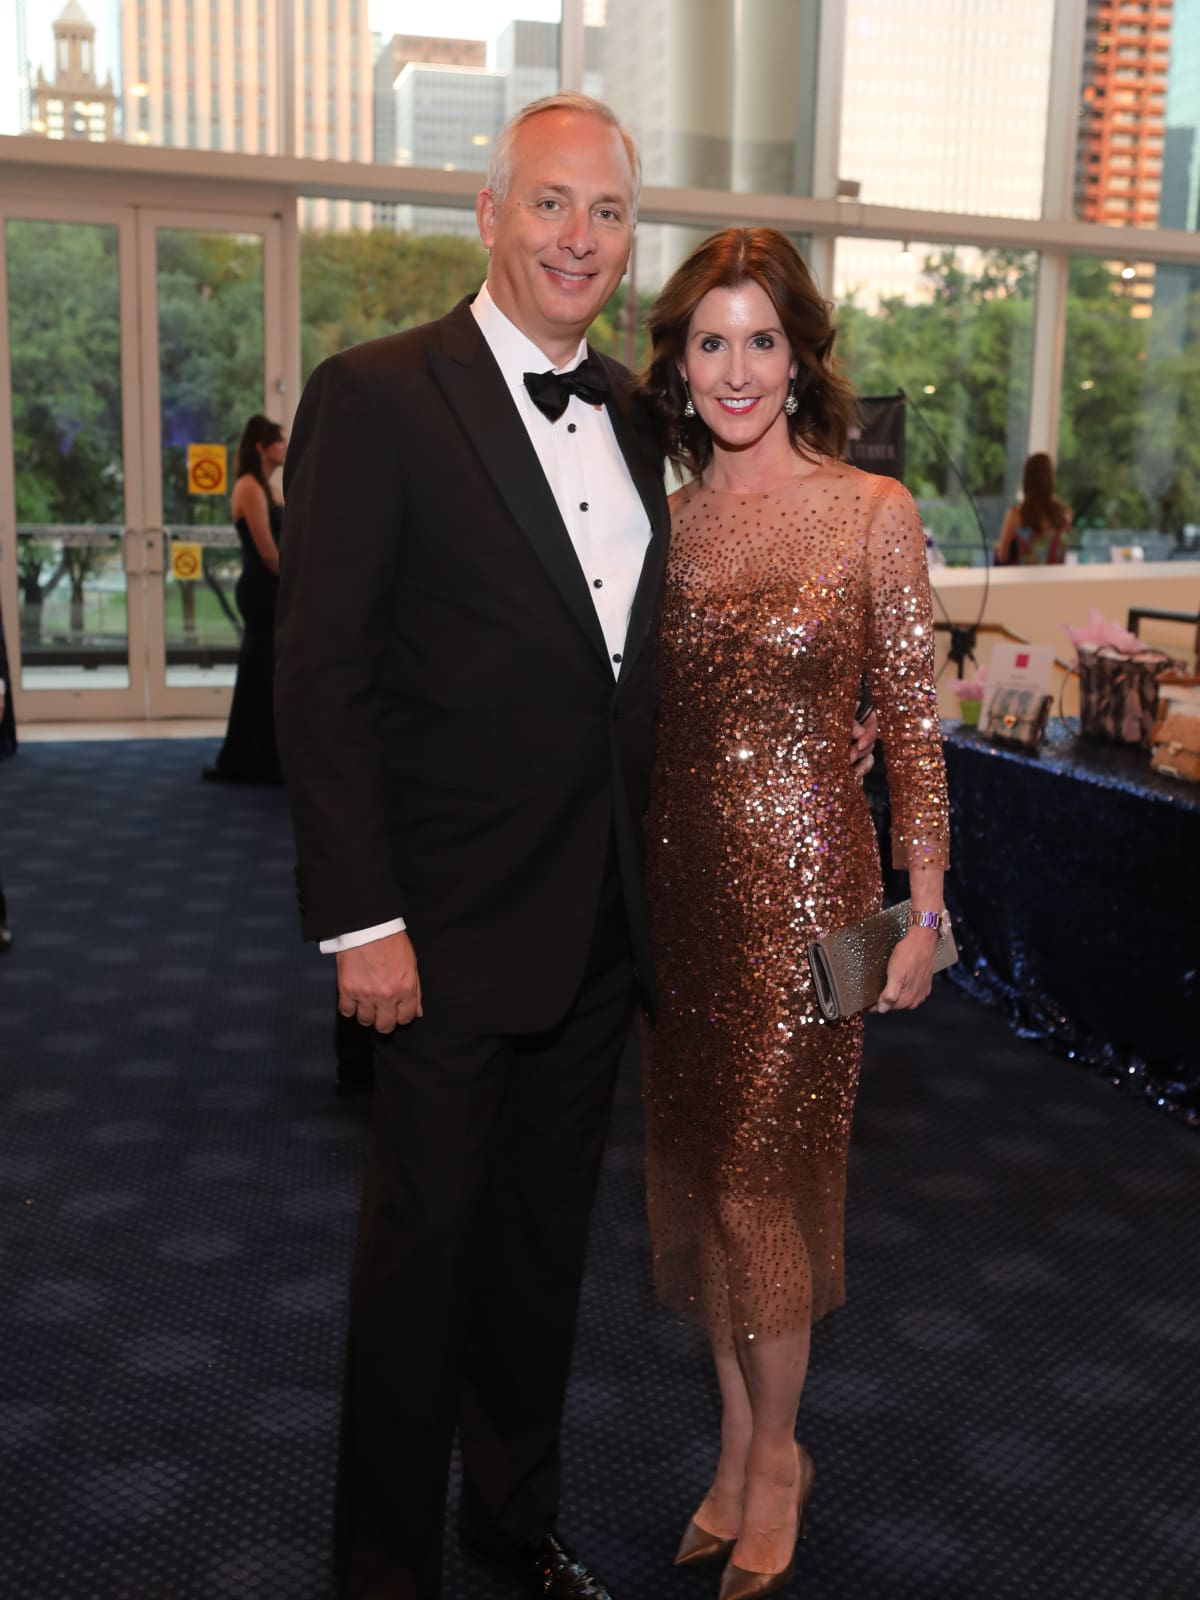 Phoebe Tudor, Bobby Tudor at 2017 TUTS Dreamgirls Gala